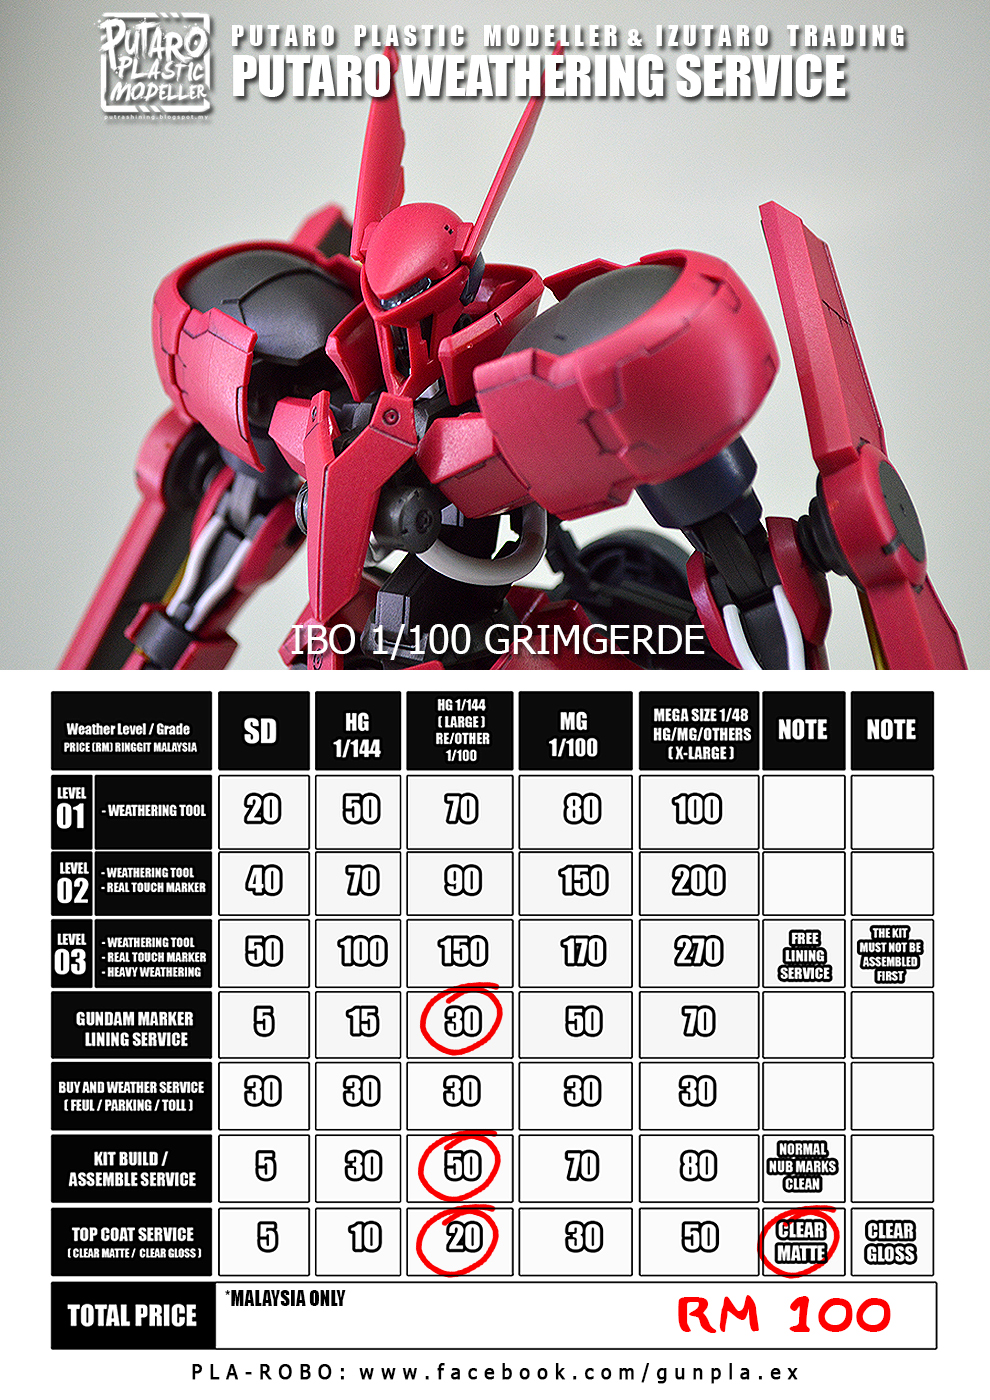 Putaro Plastic Modeller & Izutaro Trading: Weathering Service Results 02